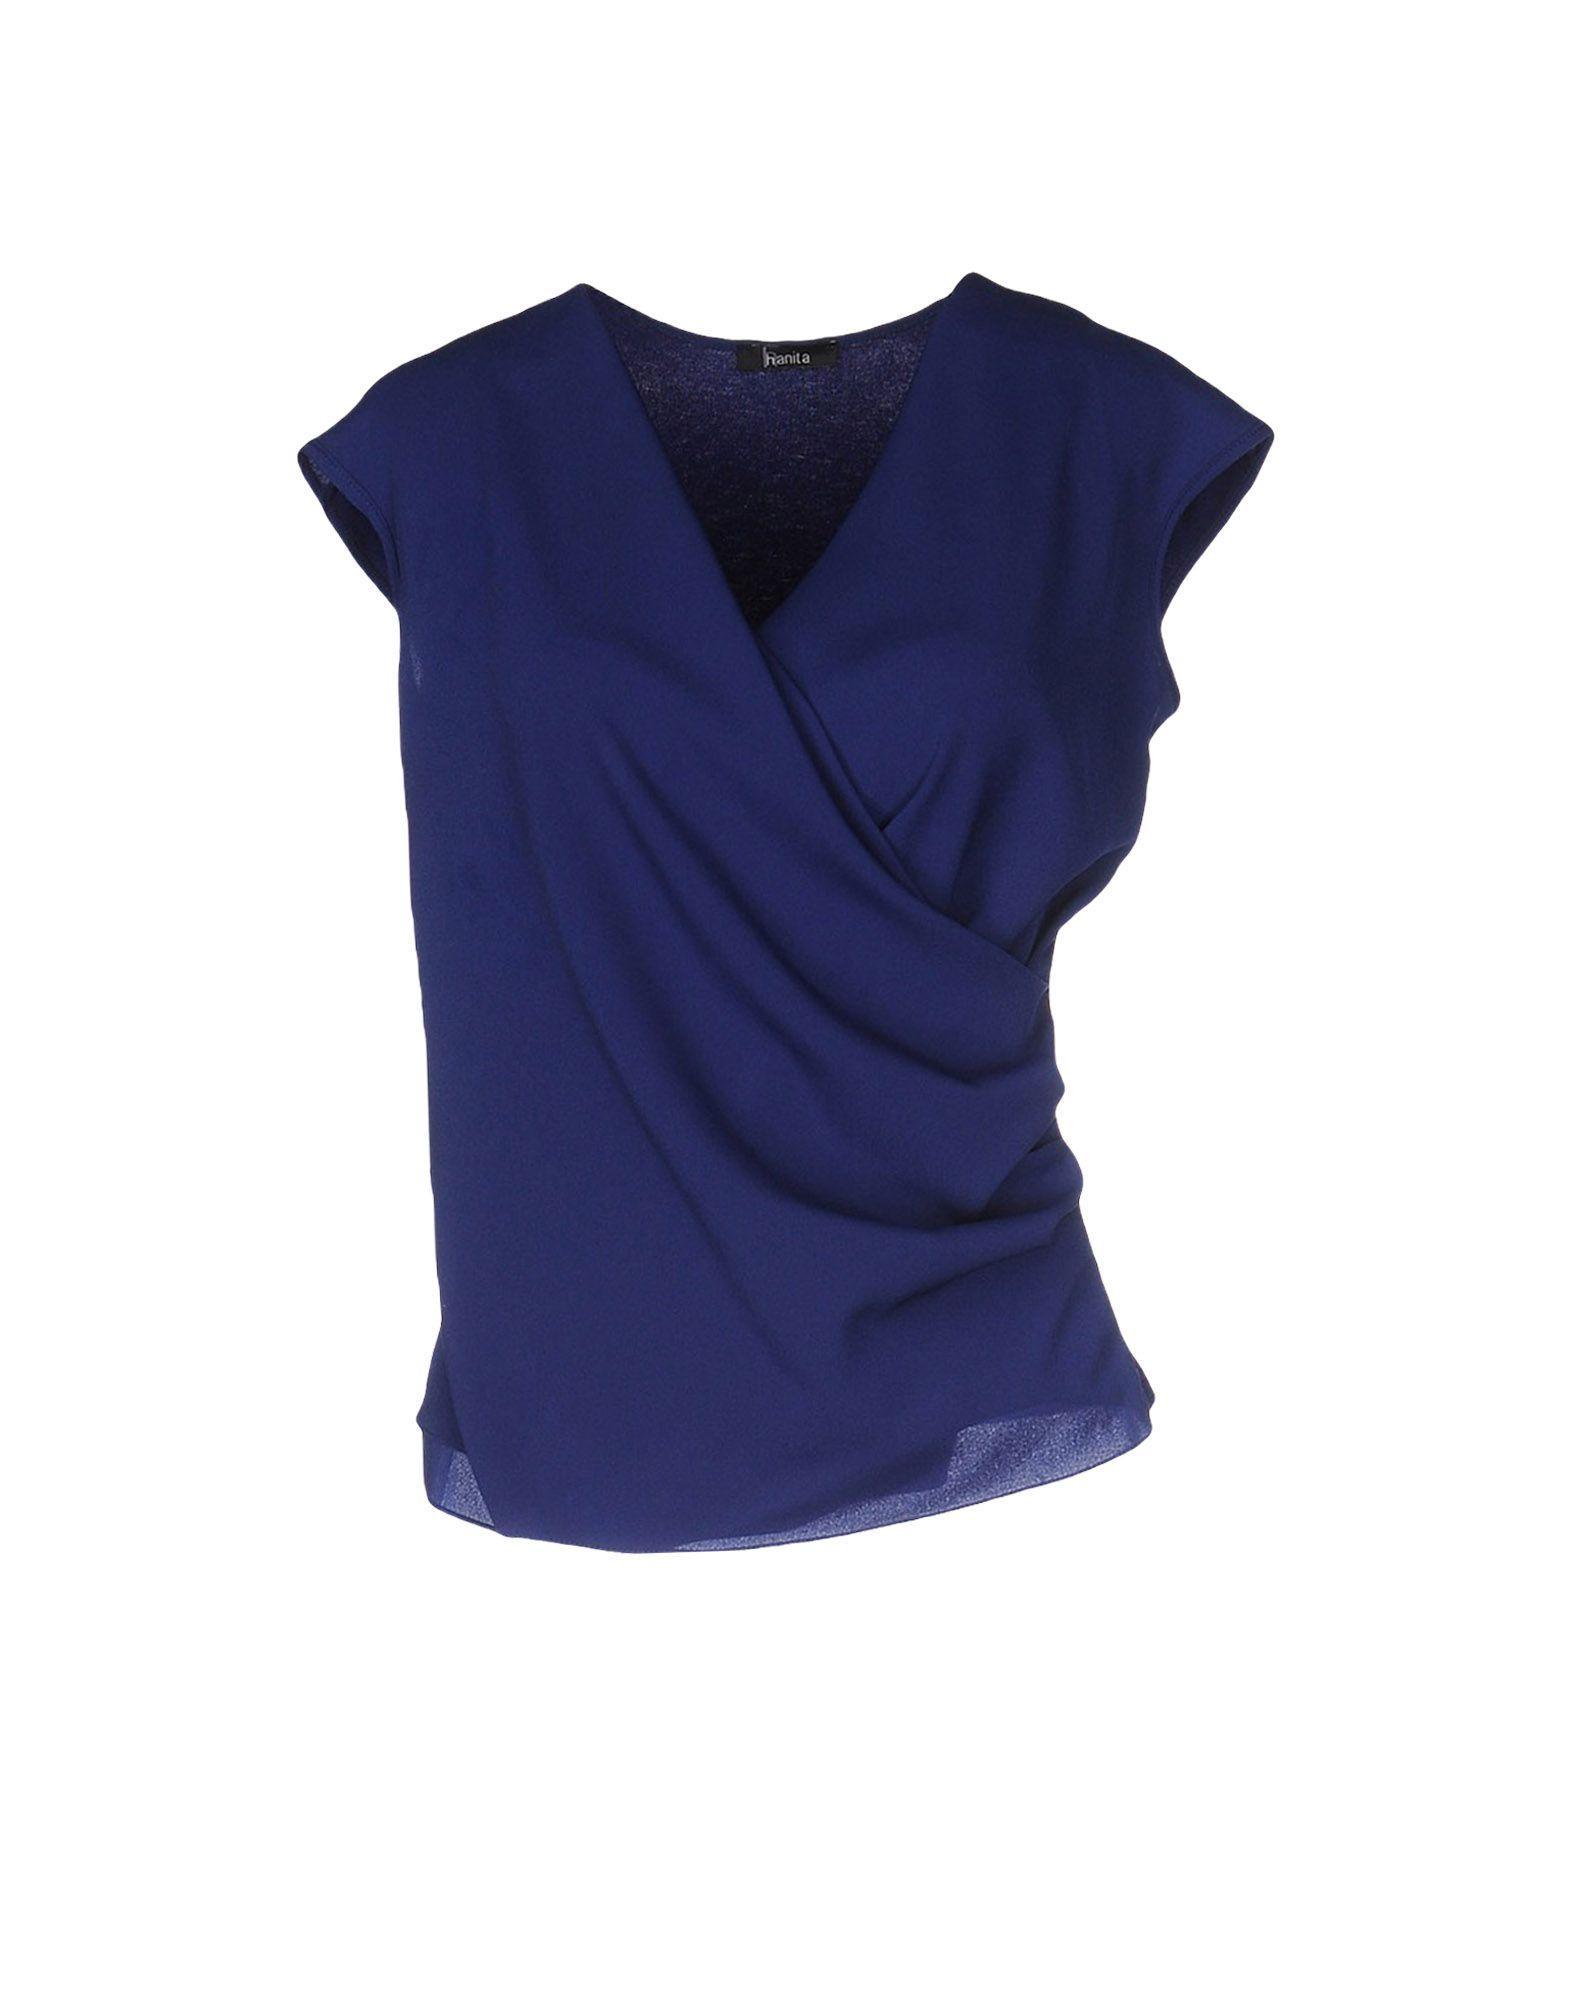 Kurt Muller Women S Clothing